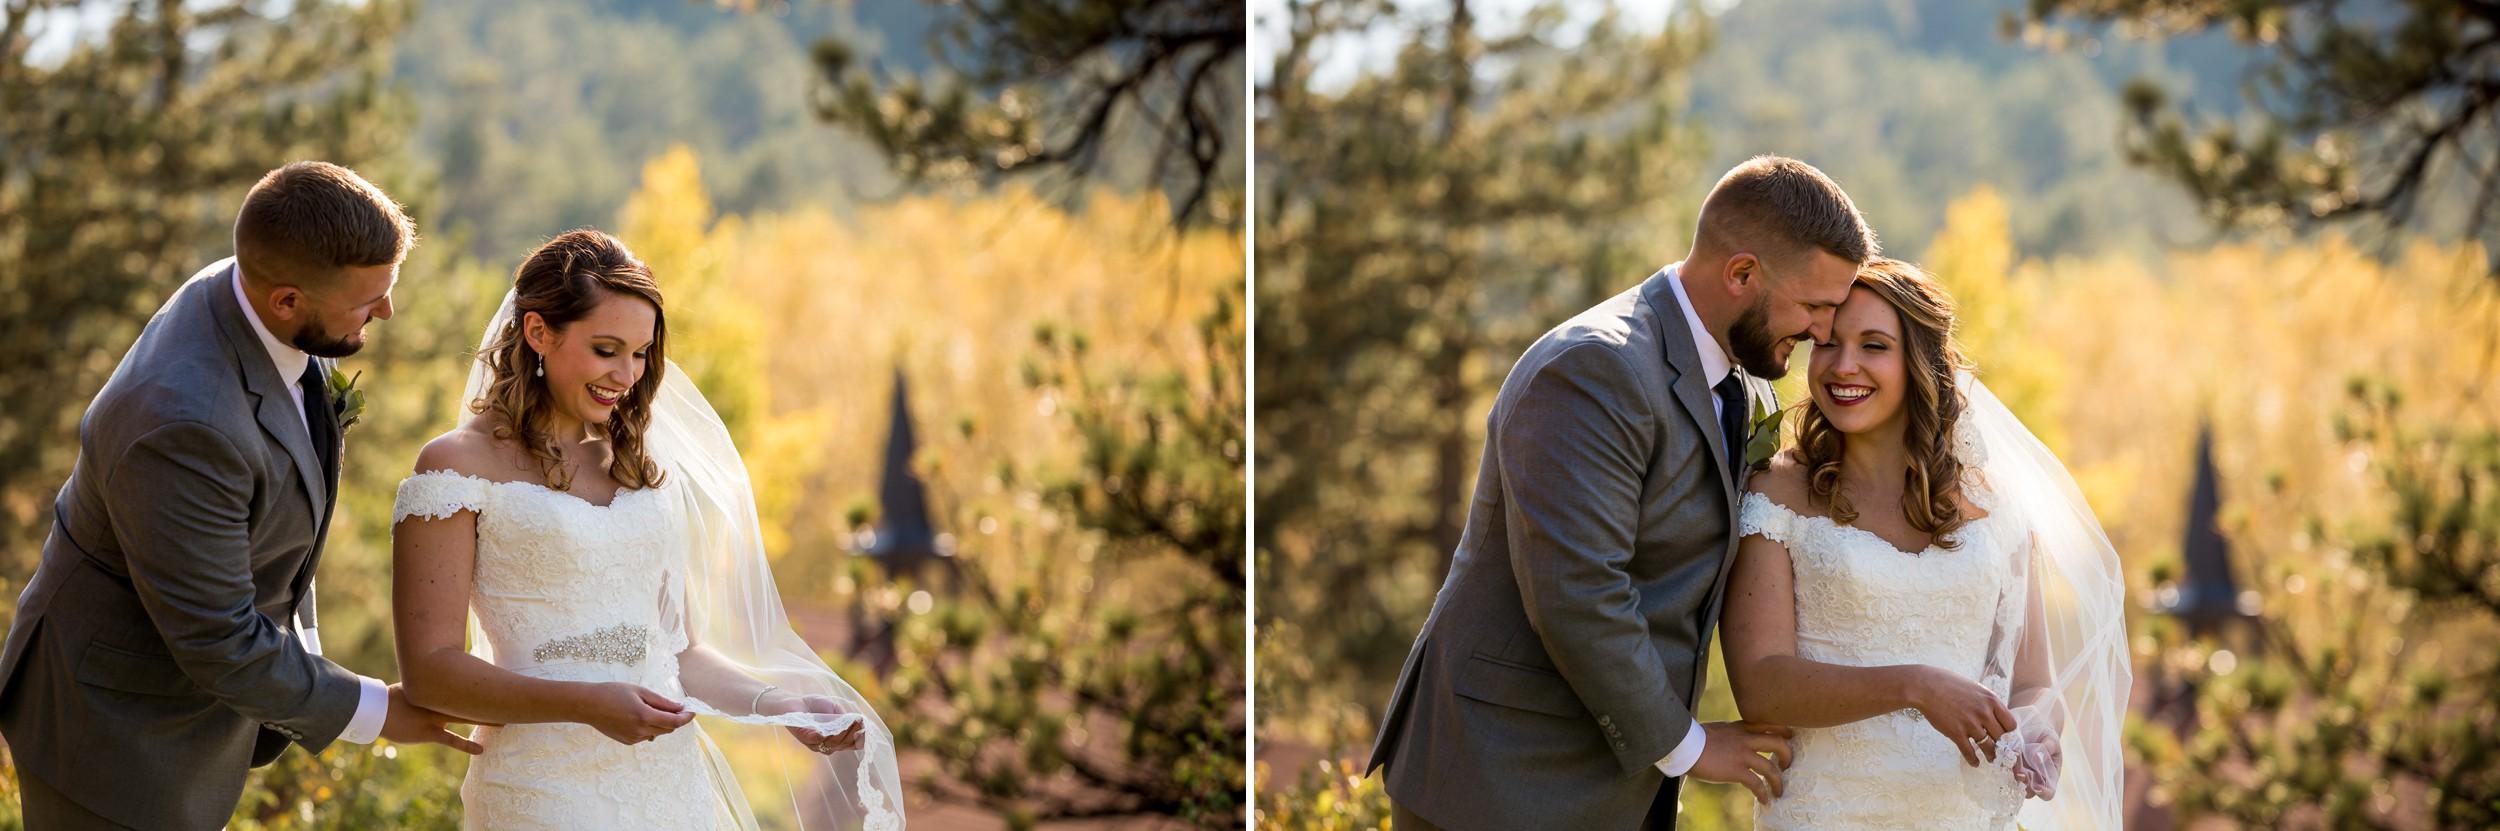 Black_Canyon_Inn_Twin_Owls_Steakhouse_Estes_Park_Wedding_Photographer 11.jpg